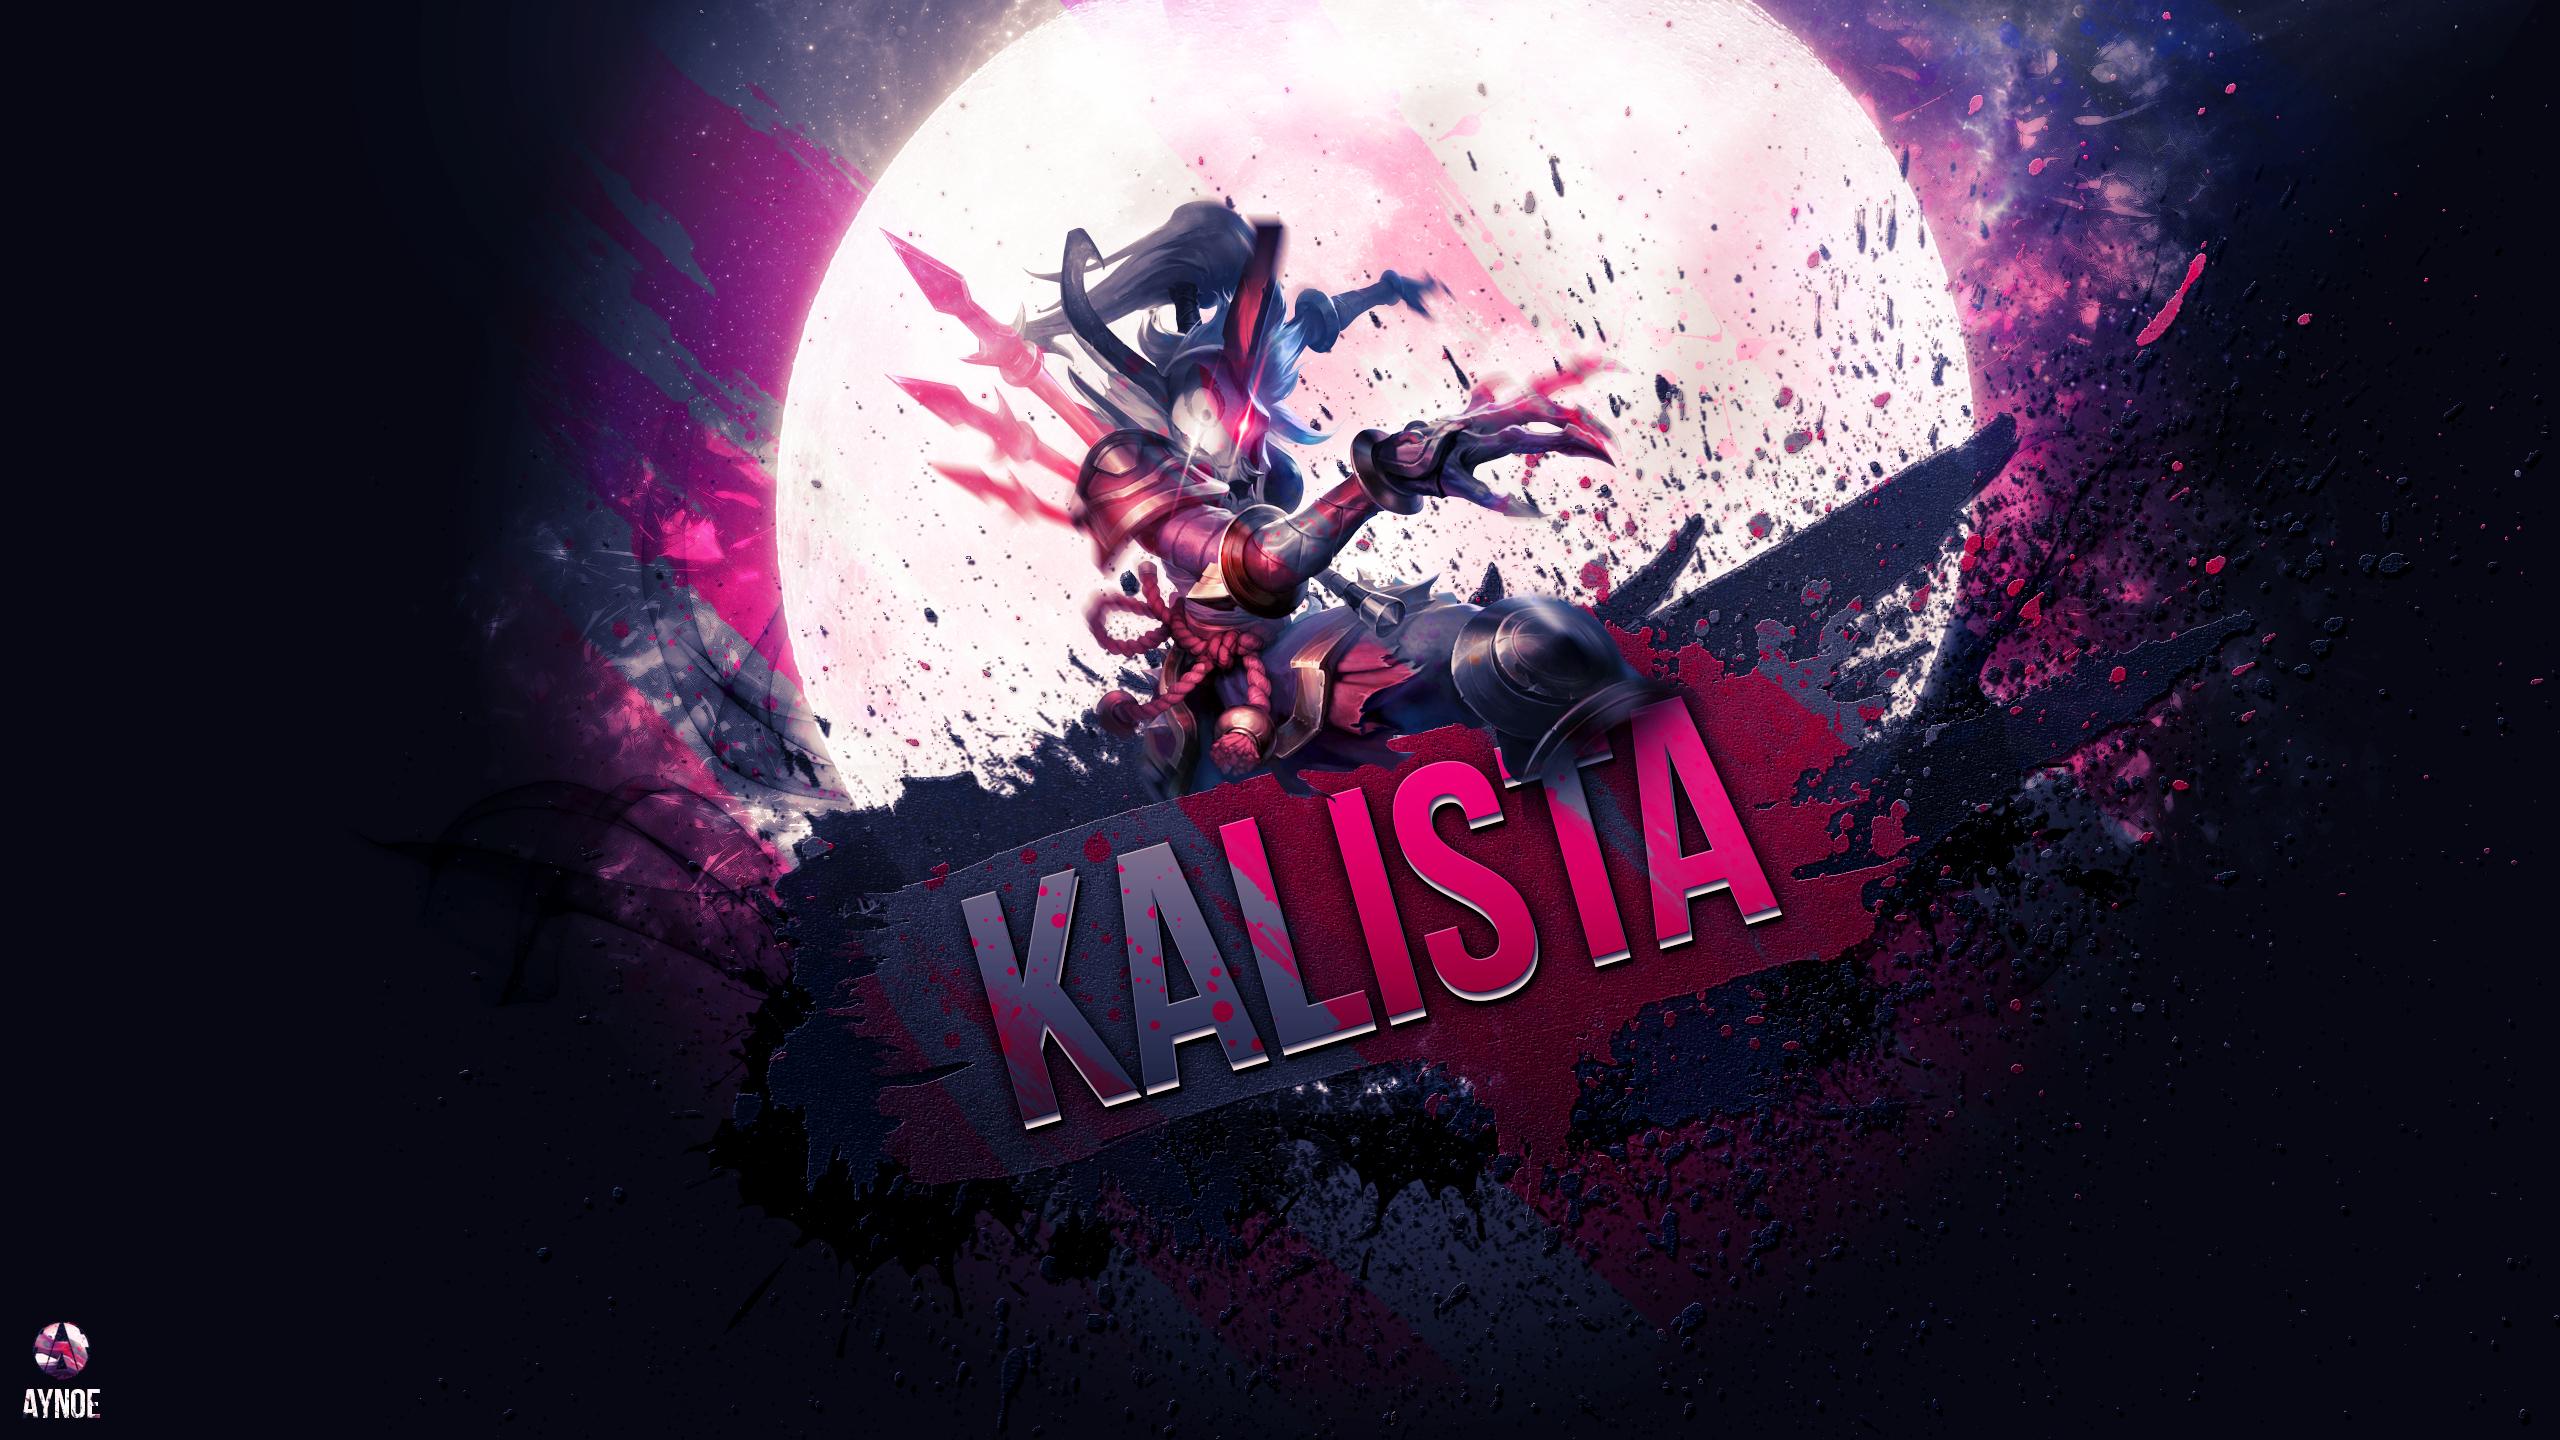 General 2560x1440 League of Legends video games Kalista anime girls